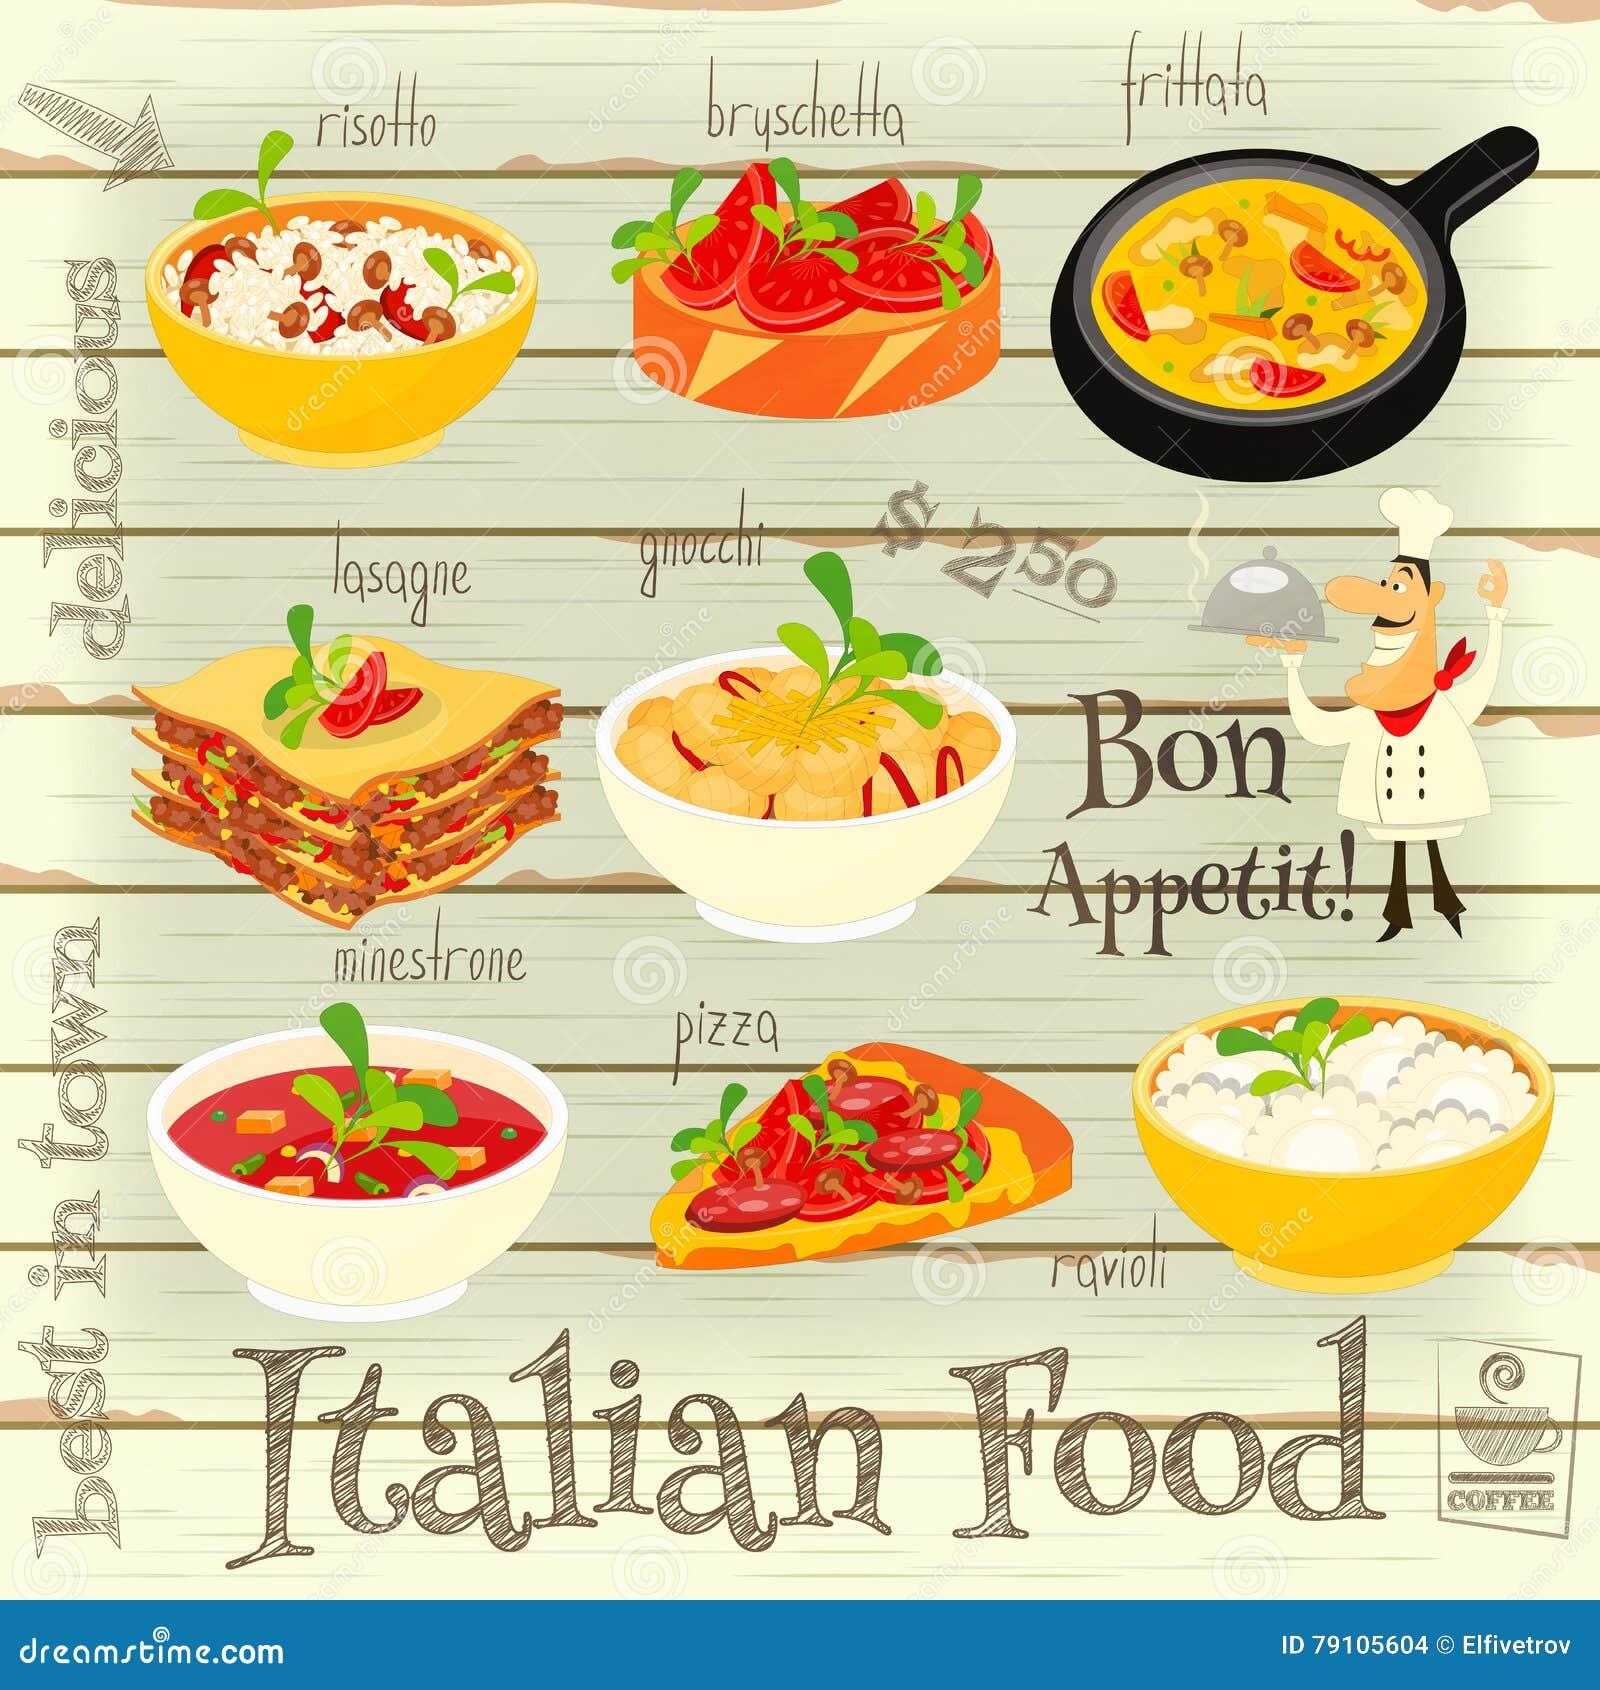 Frittata cartoons illustrations vector stock images - Italian cuisine menu list ...